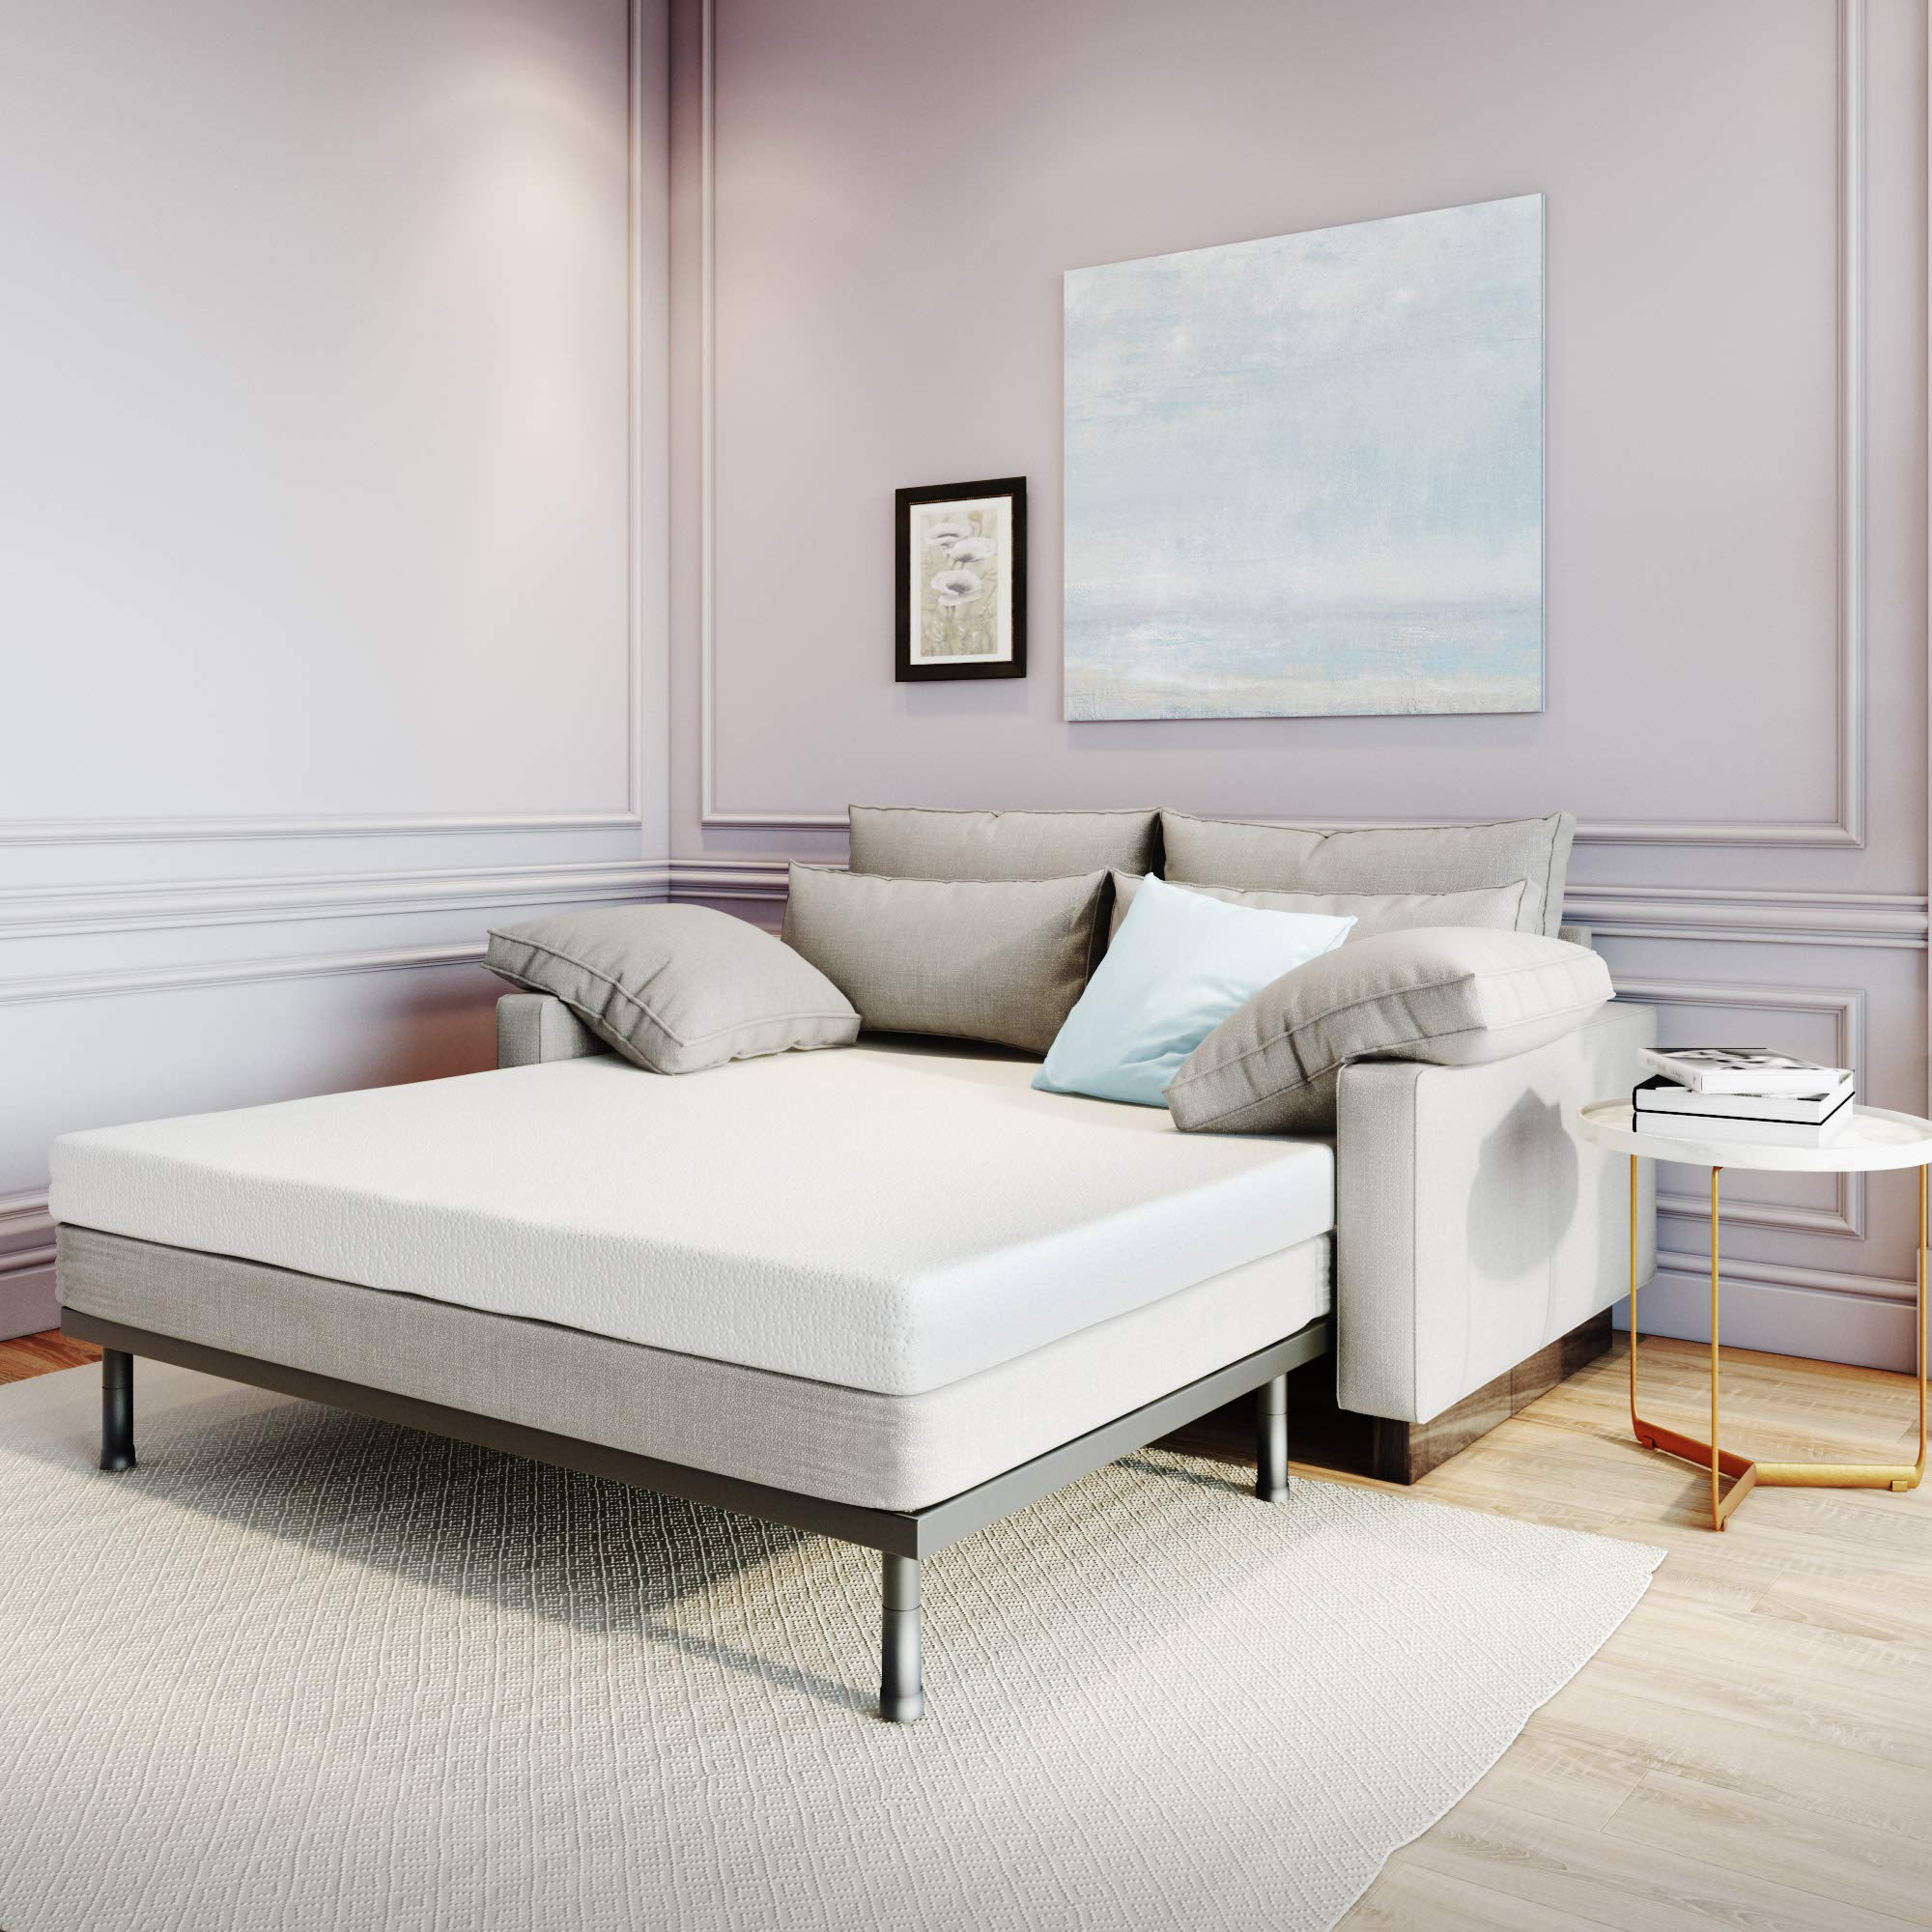 alwyn home olson 4 5 plush memory foam mattress